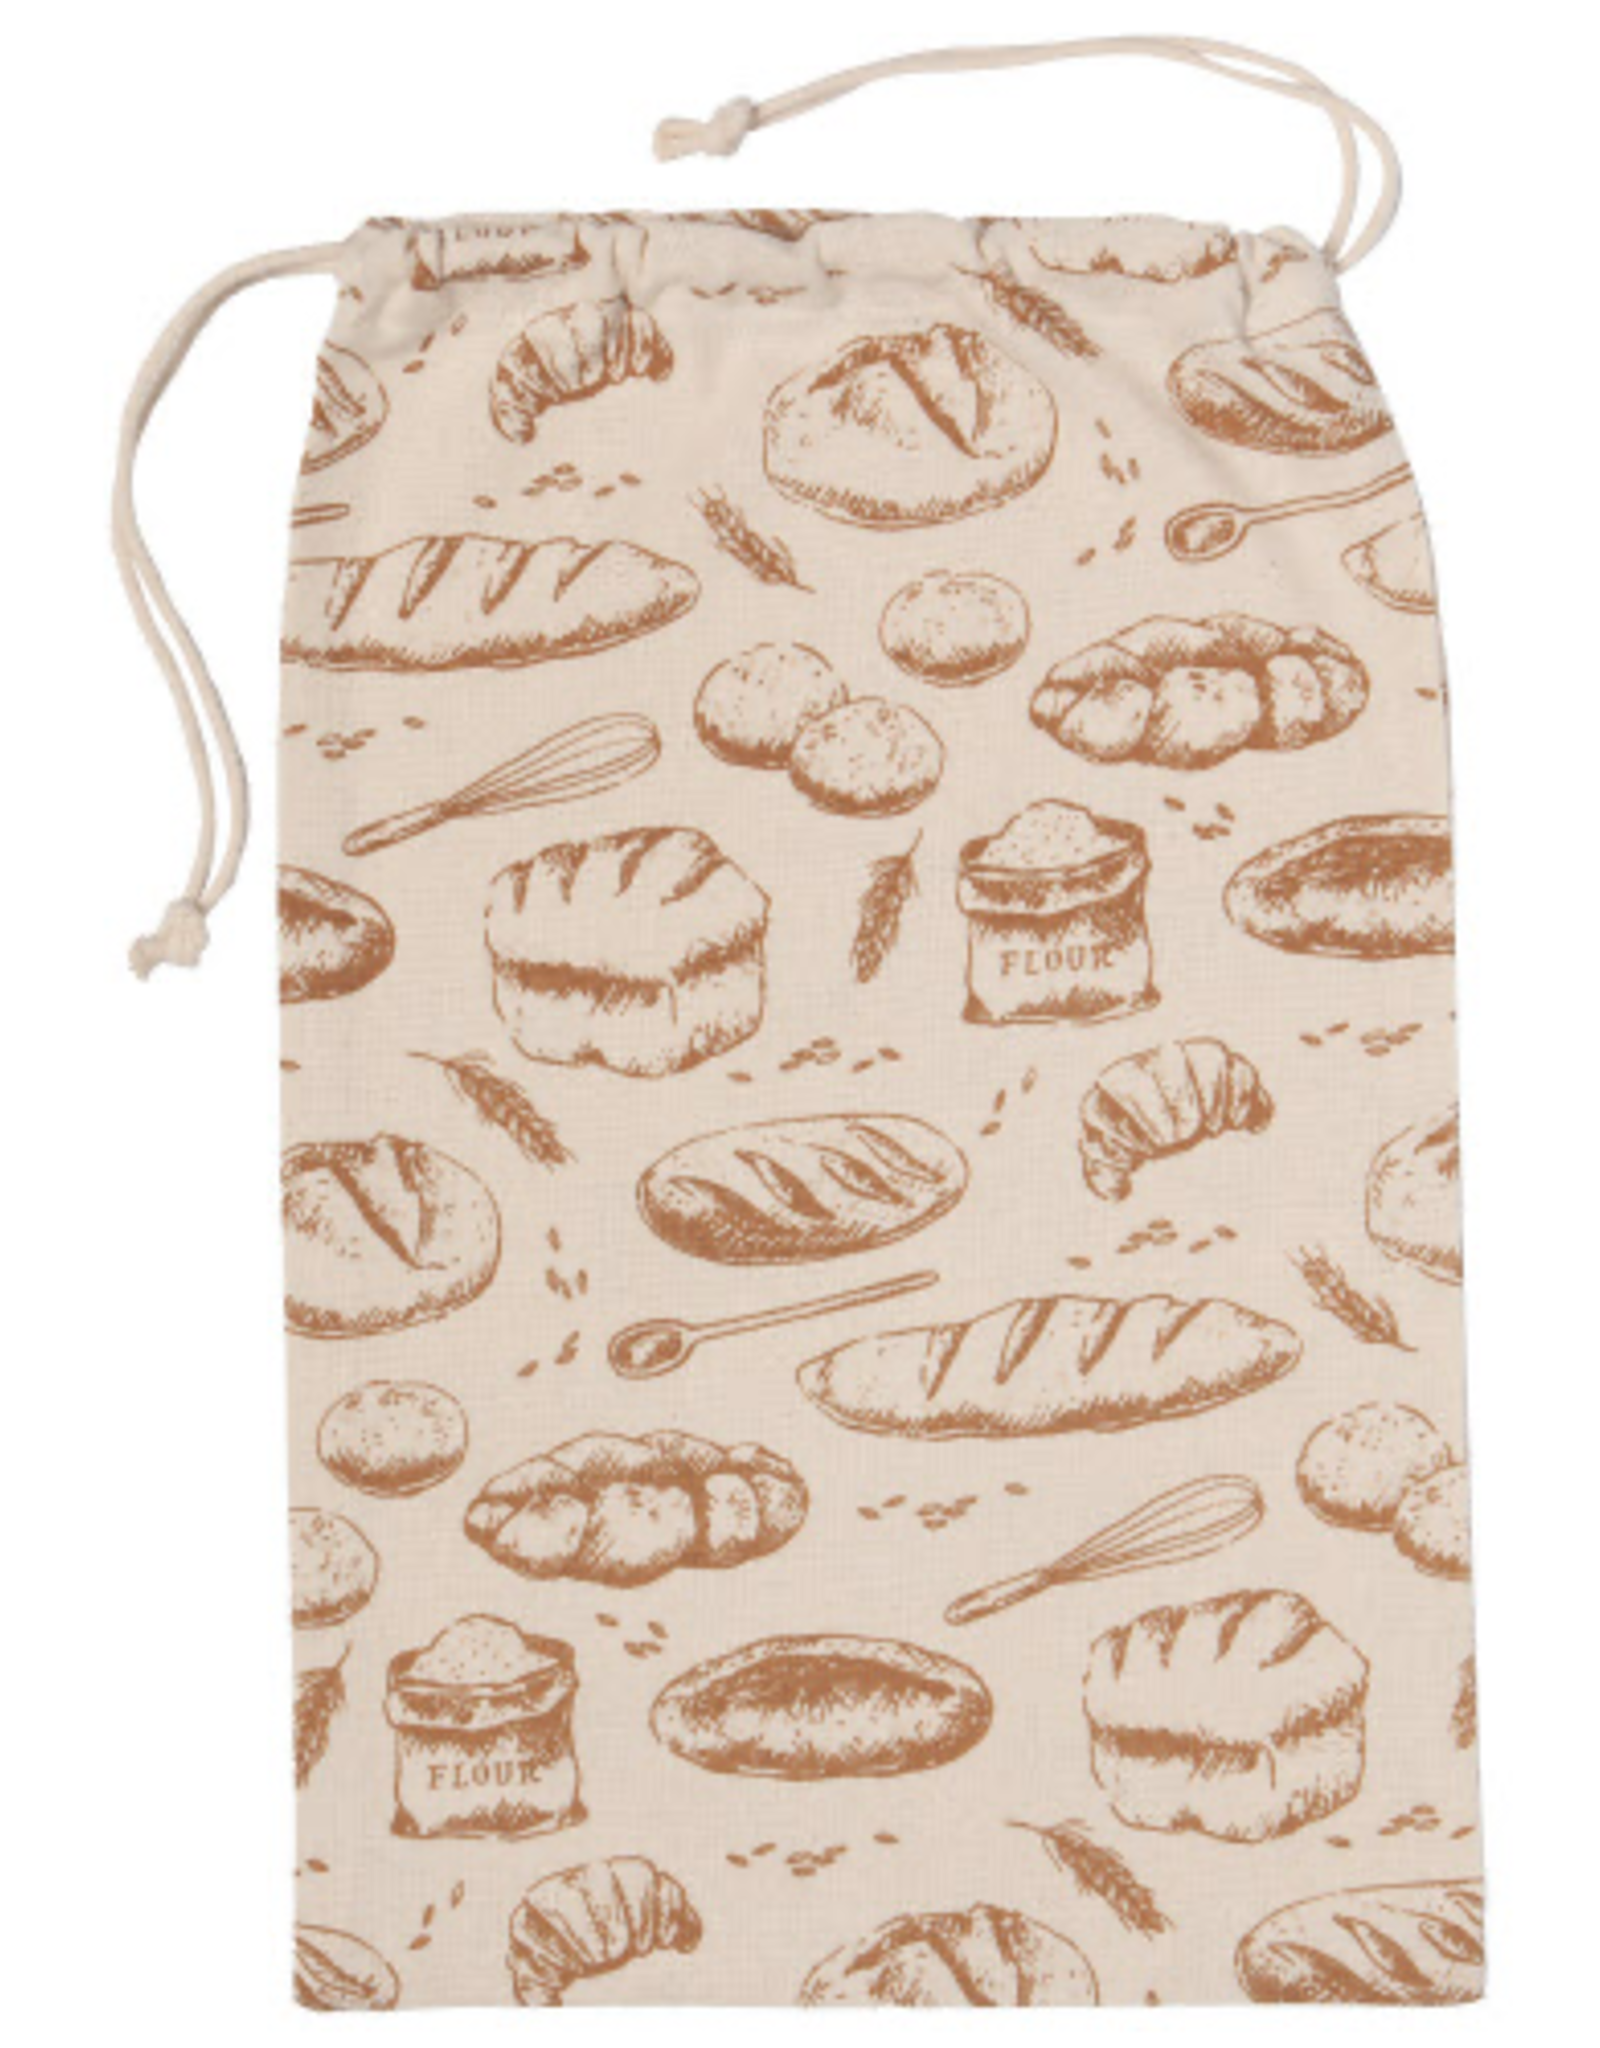 Danica Danica Fresh Baked Bread Bag